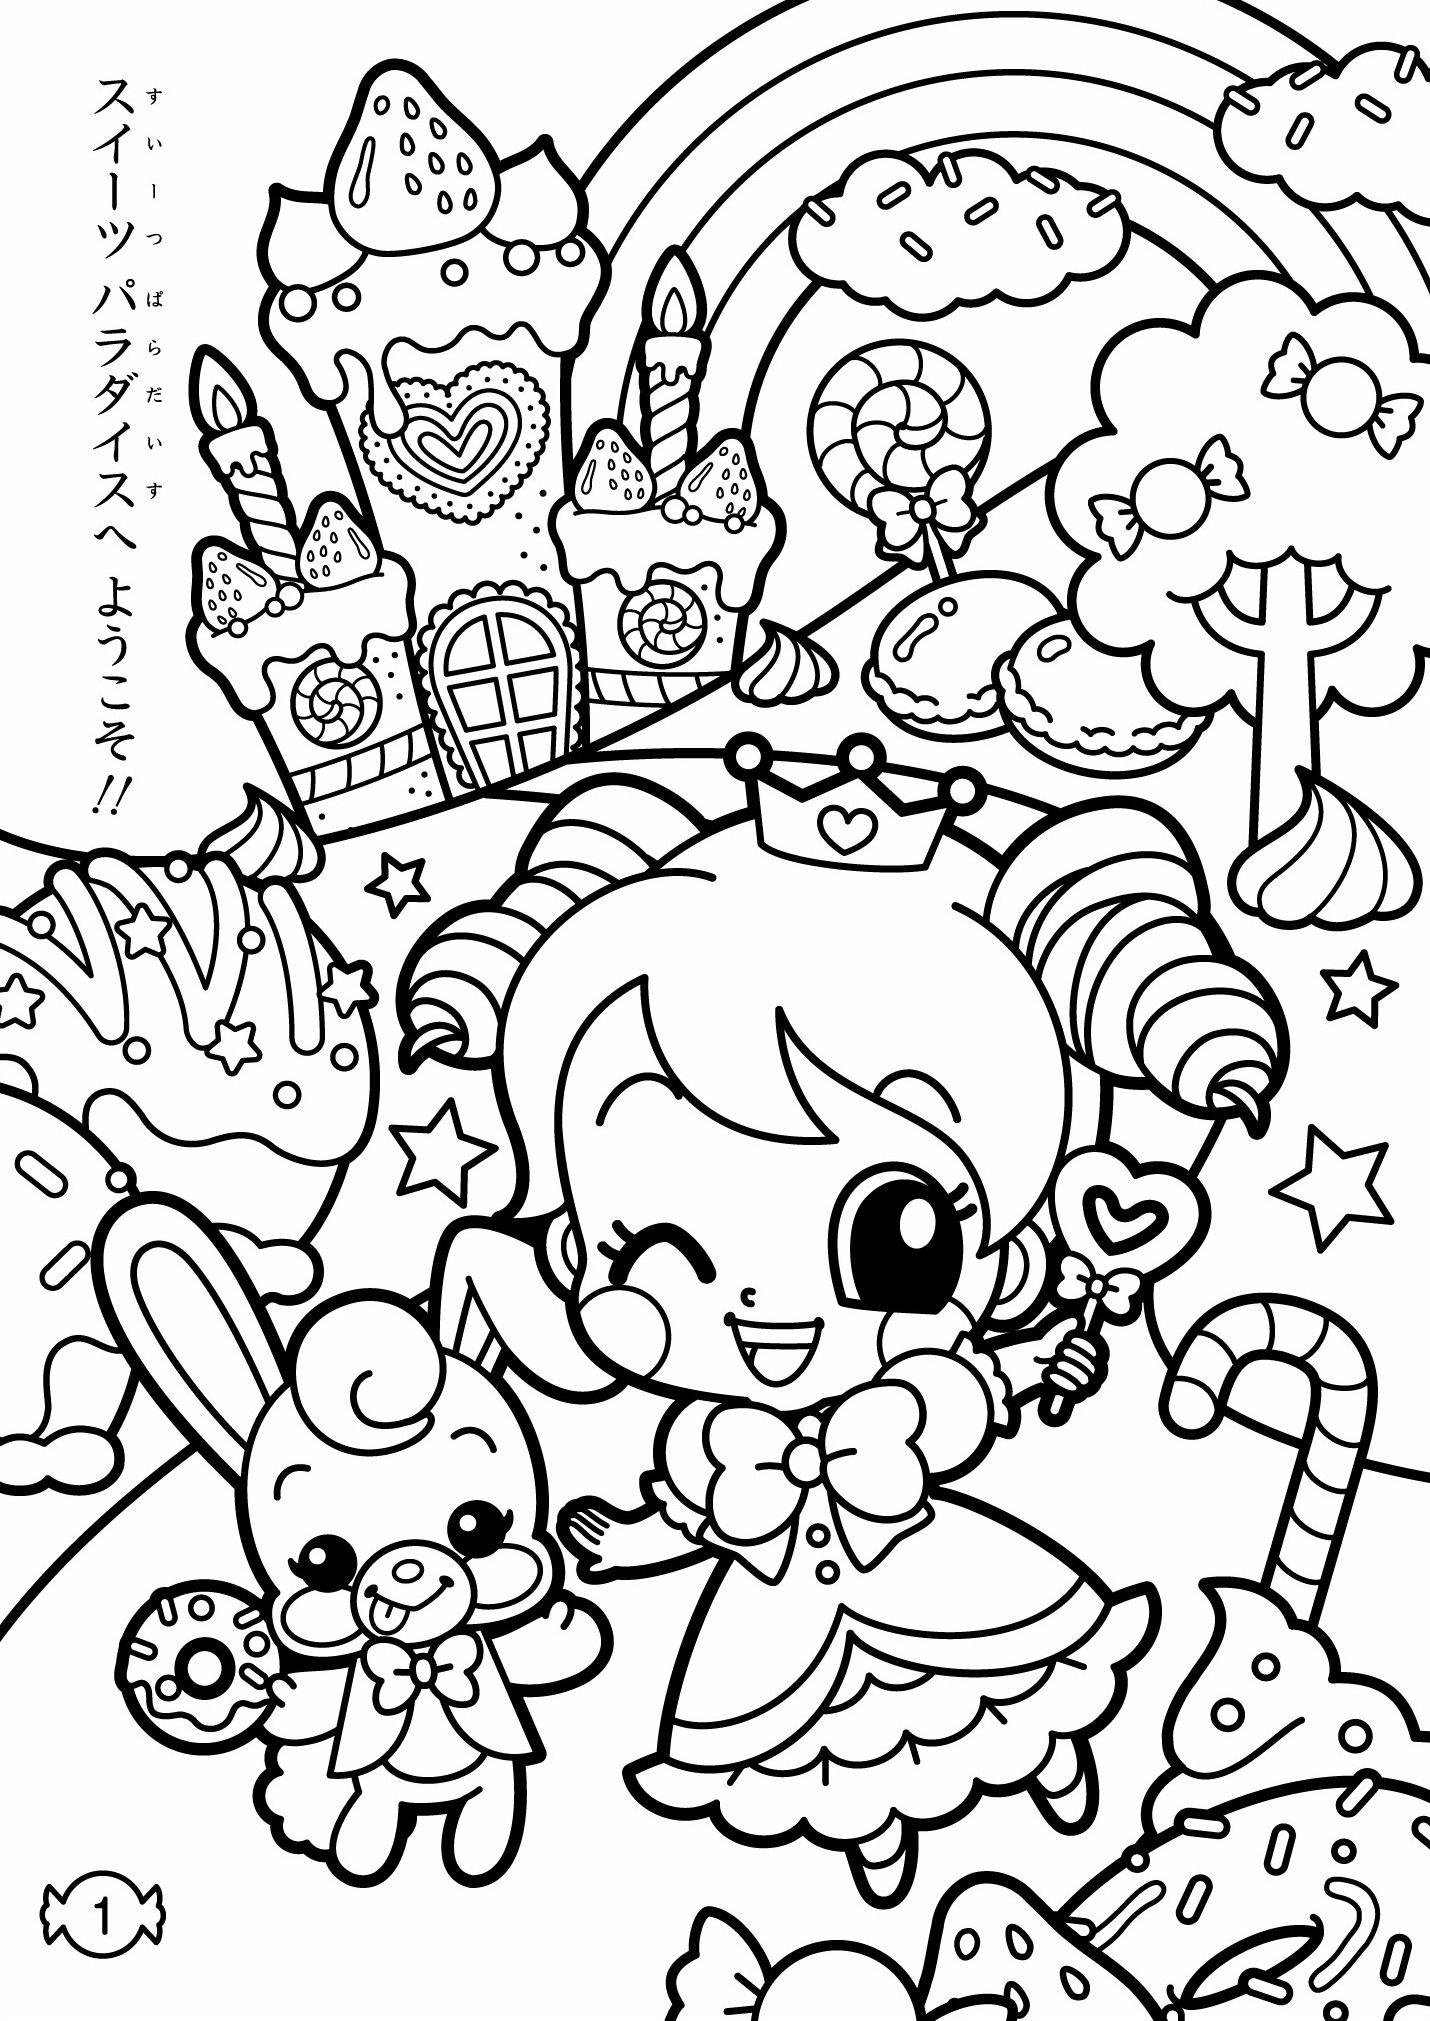 1430x2021 Kawaii Kawaii Things Kawaii, Coloring Books